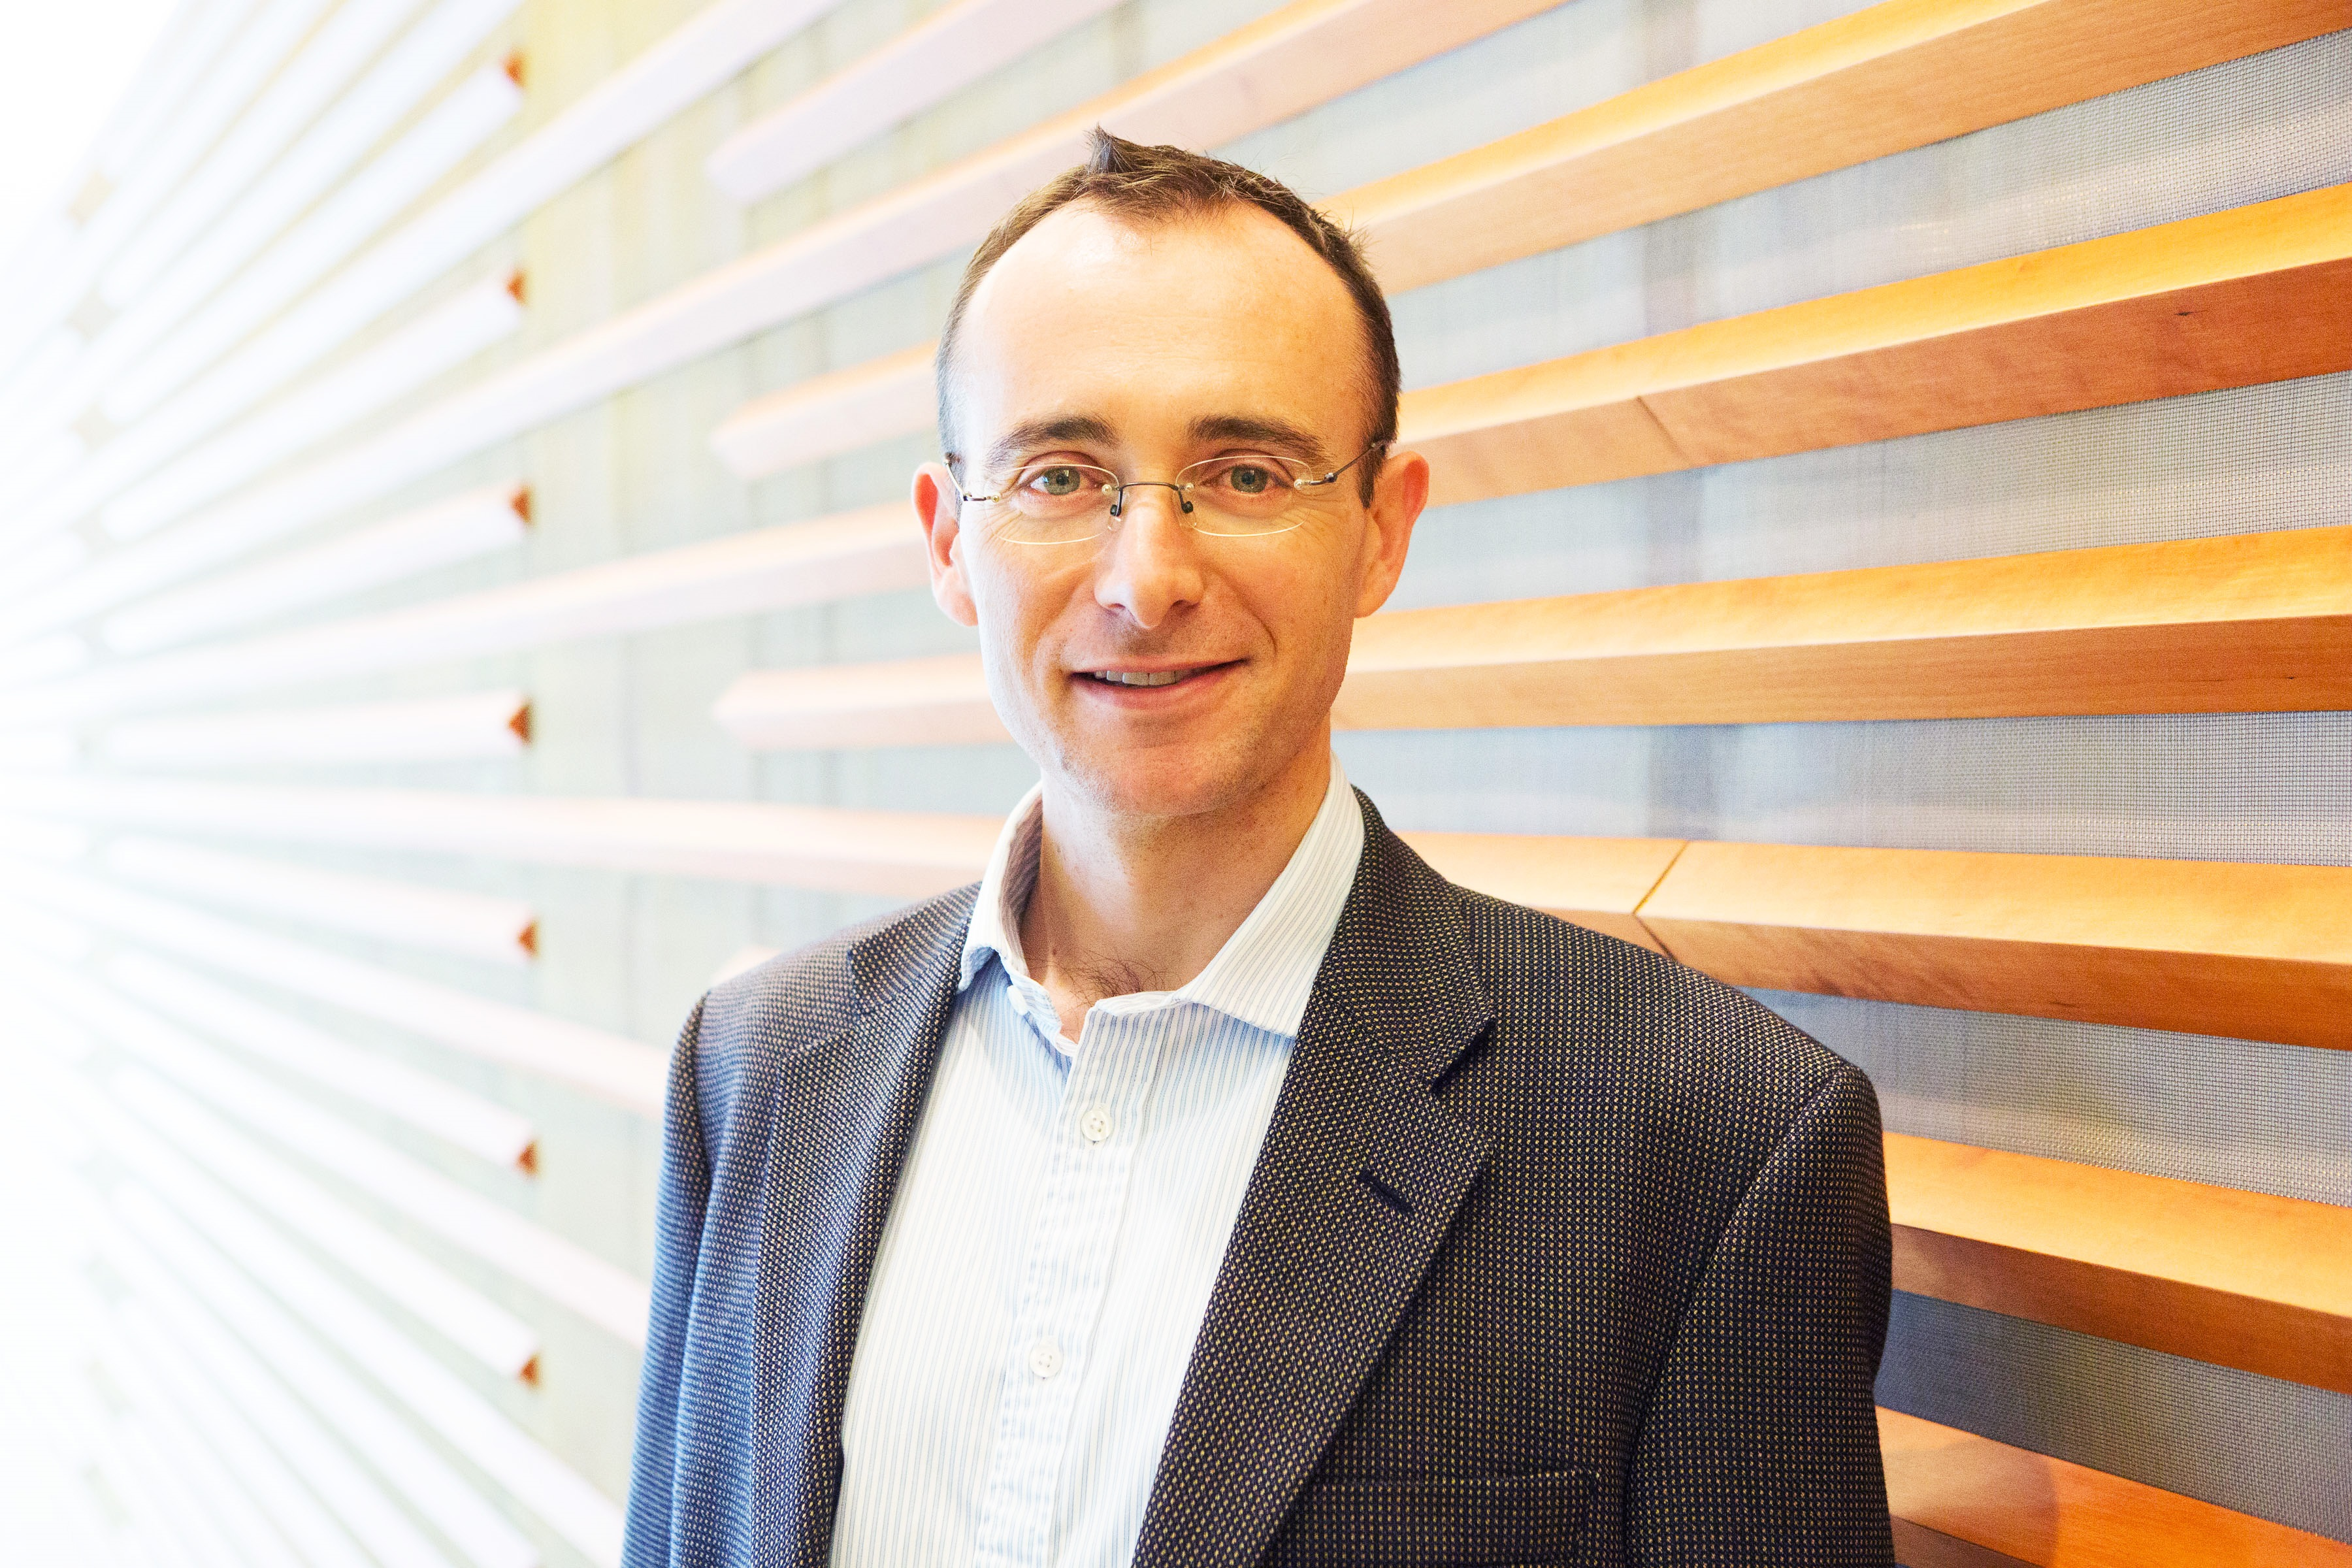 James Mabbott, Head of KPMG Innovate